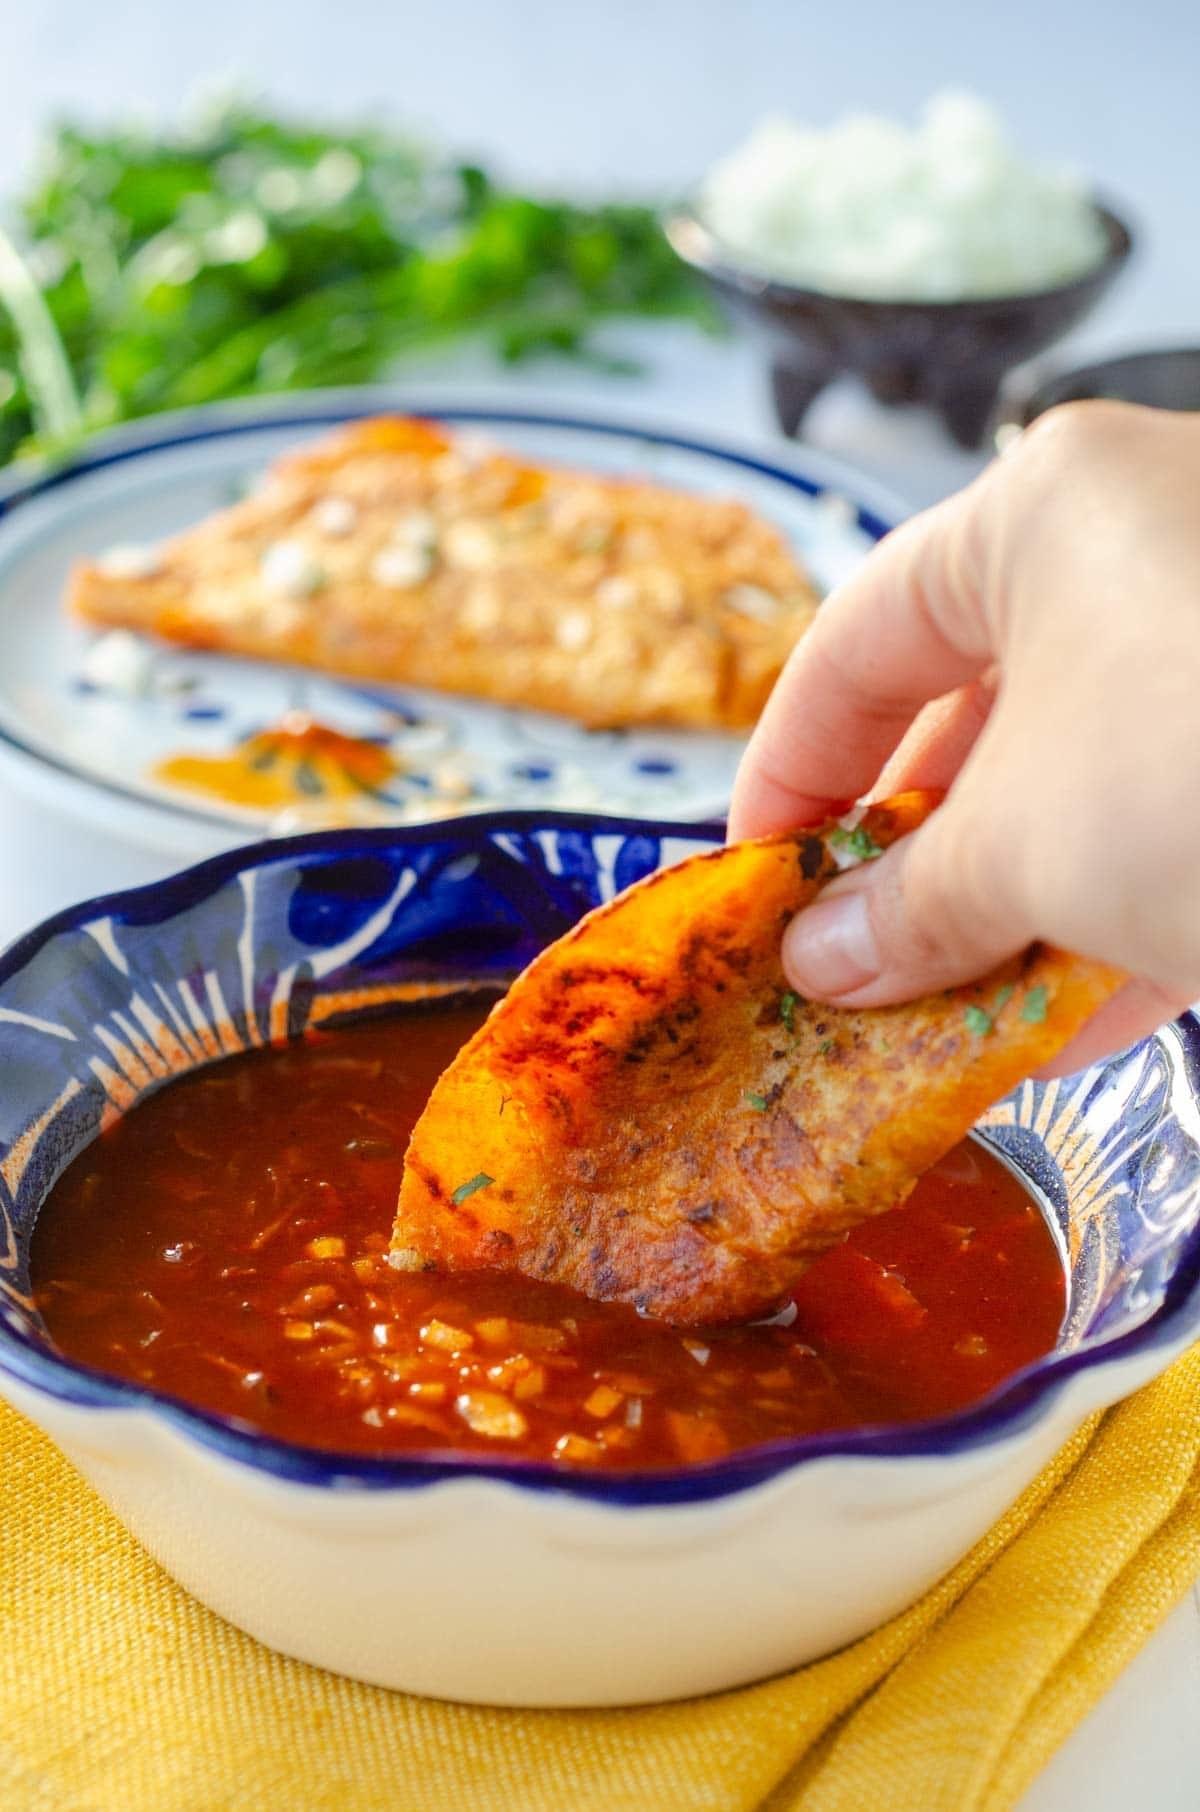 A vegan birria taco being dipped in broth.